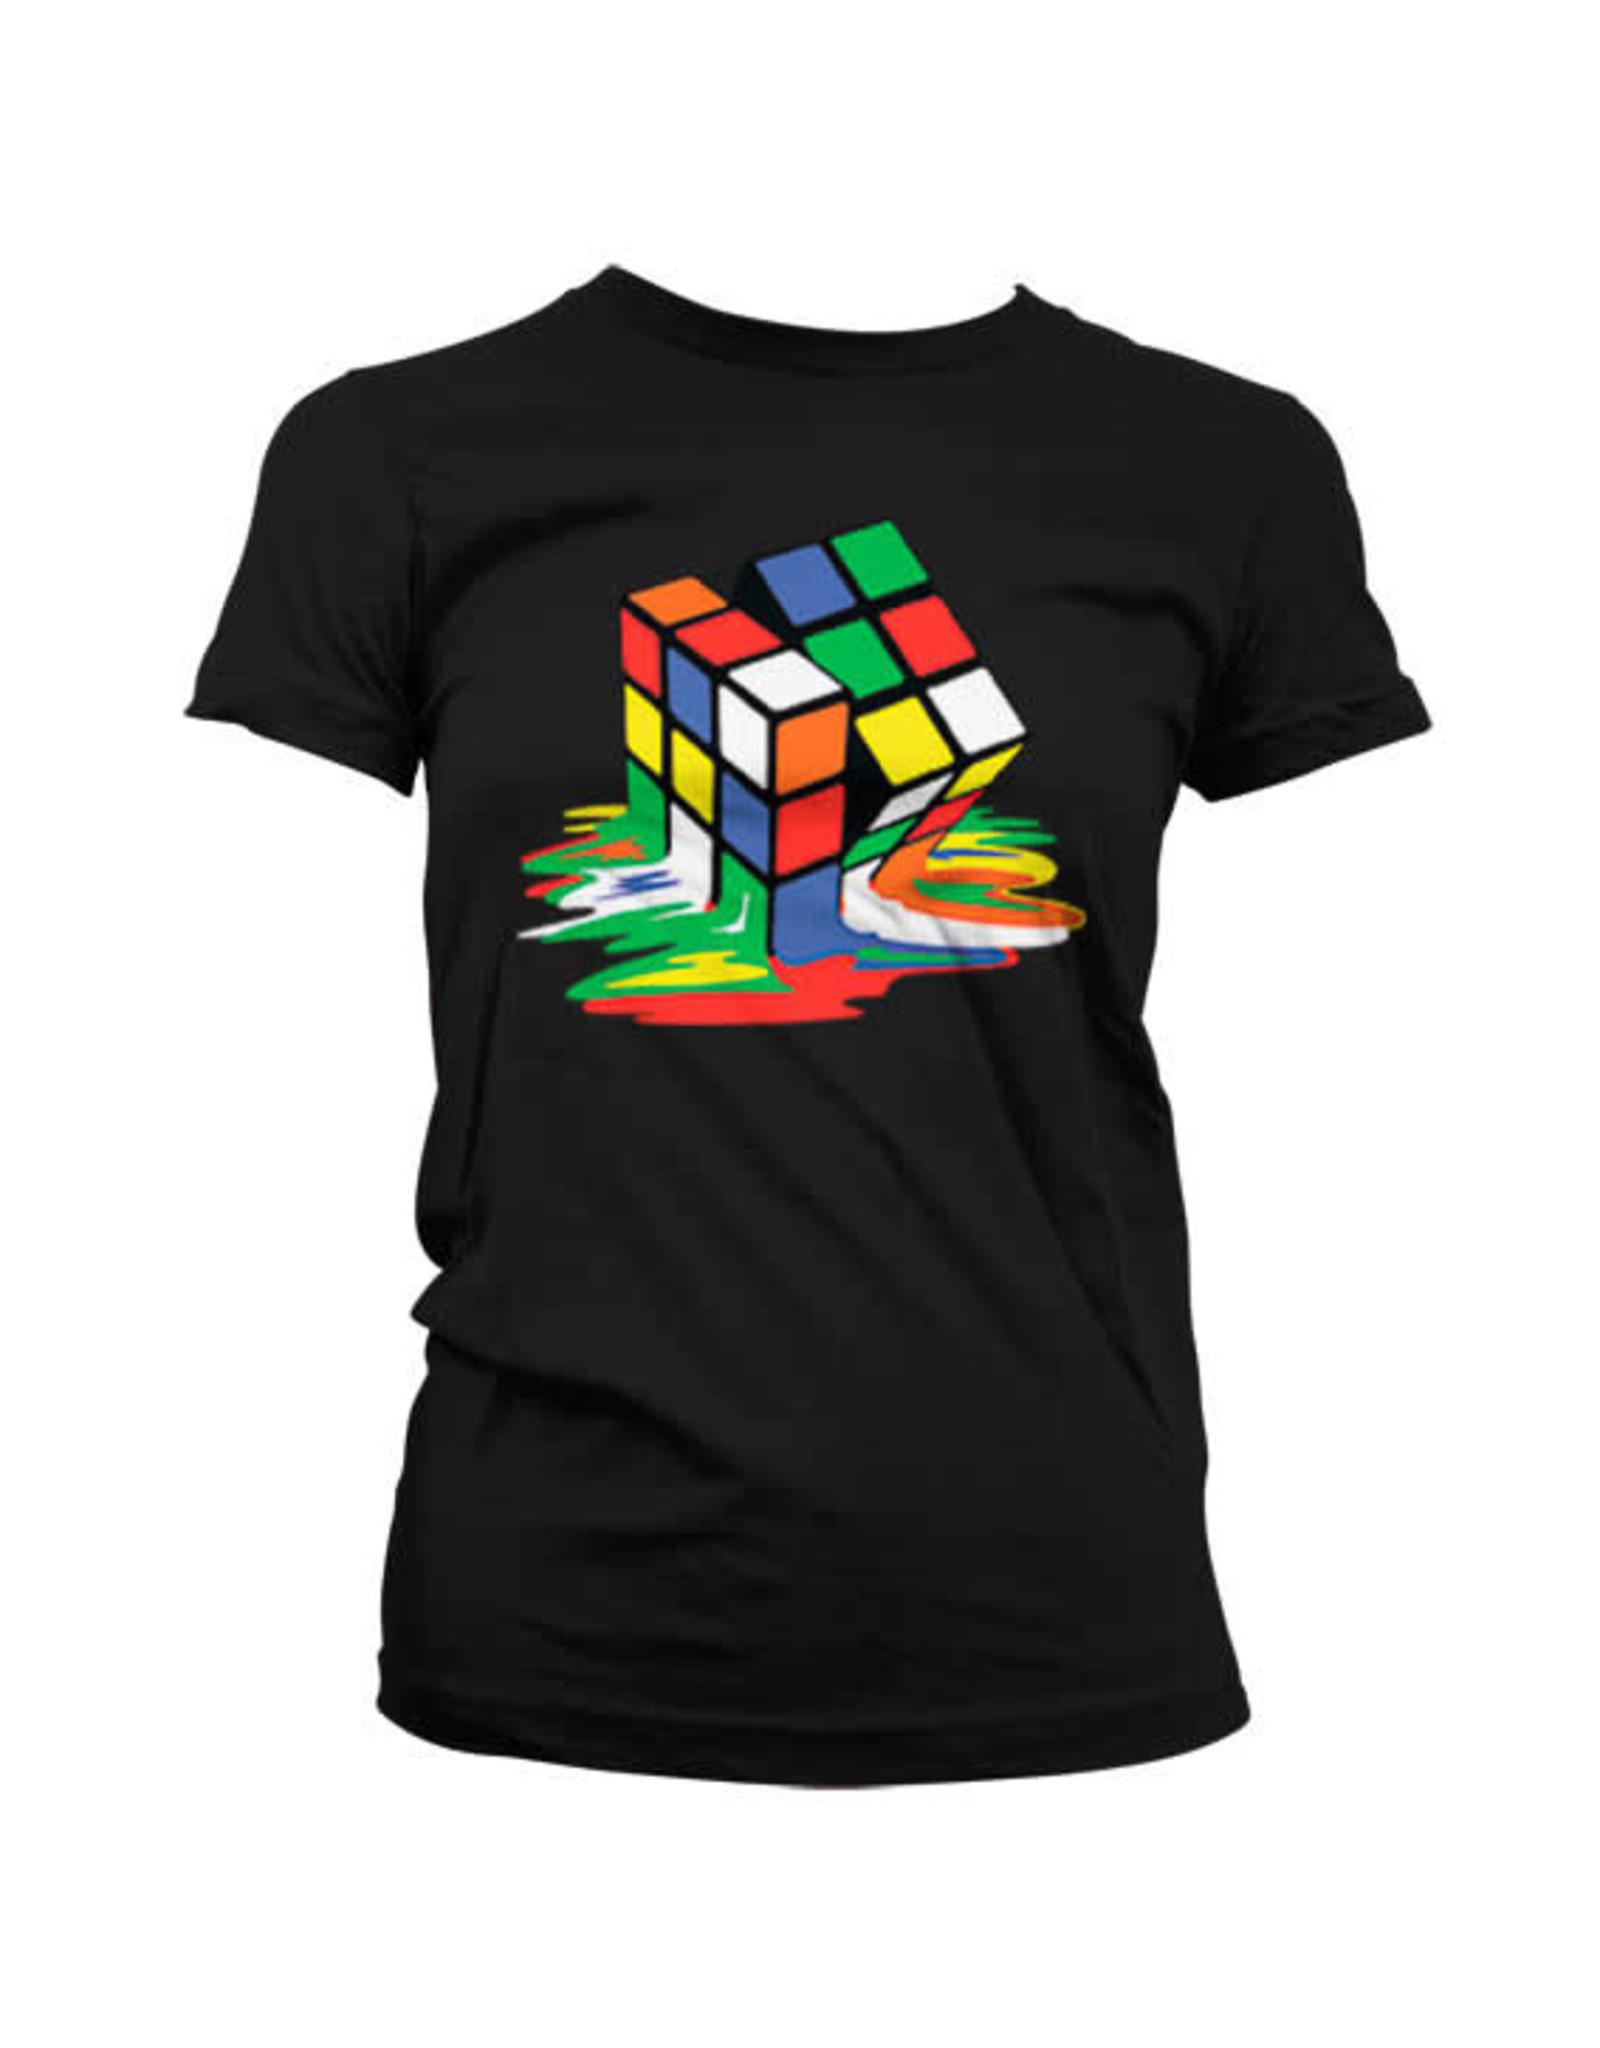 RUBIK'S - T-Shirt Melting Rubik's - GIRL (M)